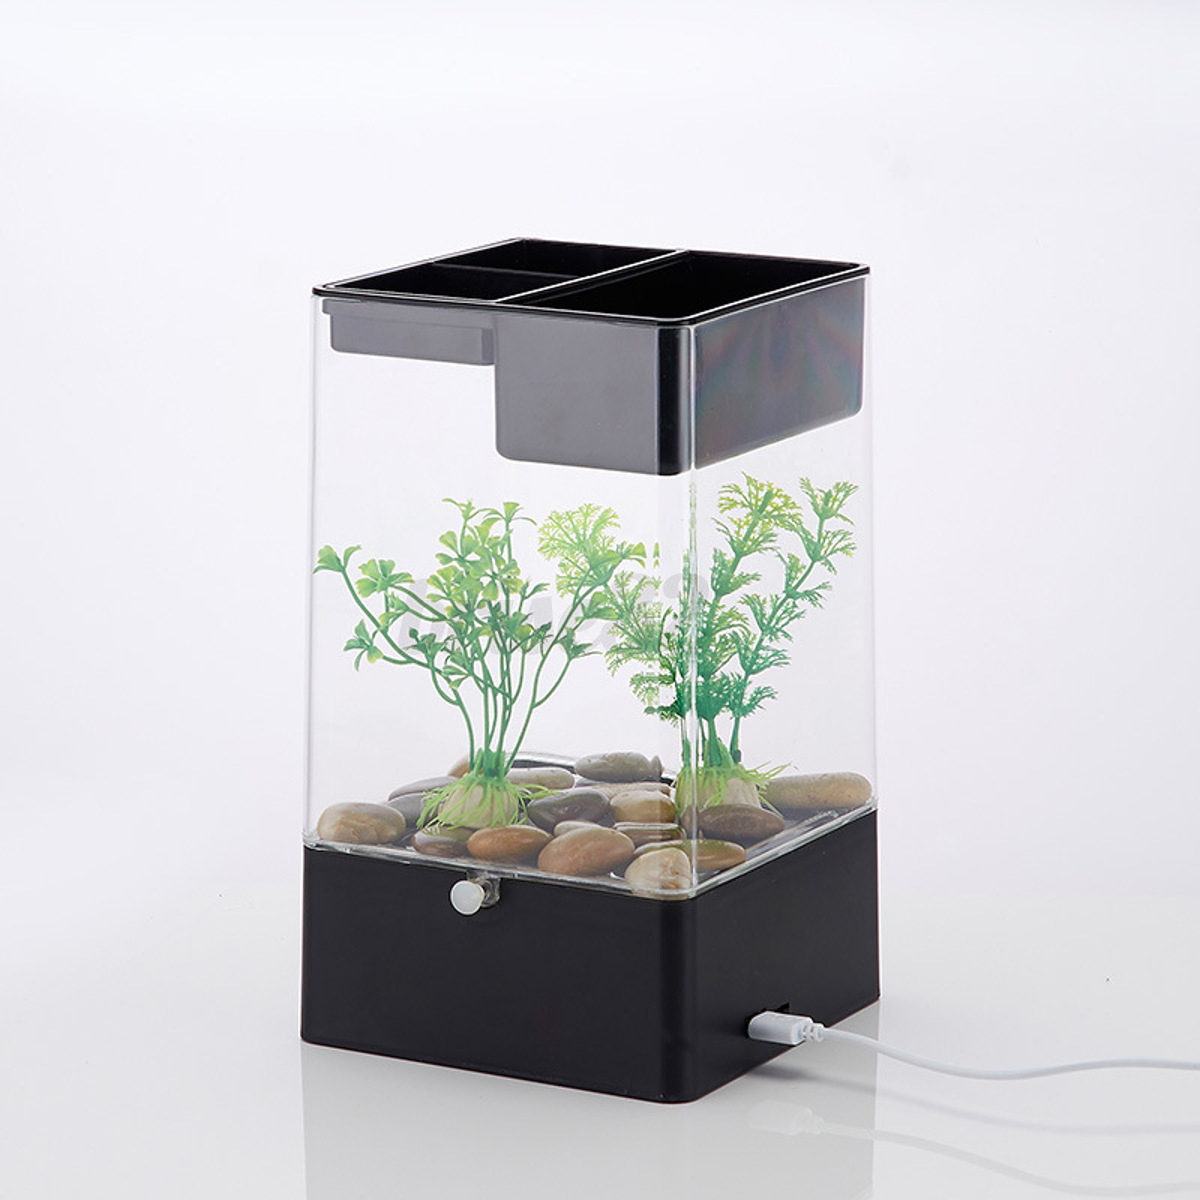 fish tank for office. LED-Light-Square-USB-Interface-Aquarium-Ecological-Office- Fish Tank For Office G